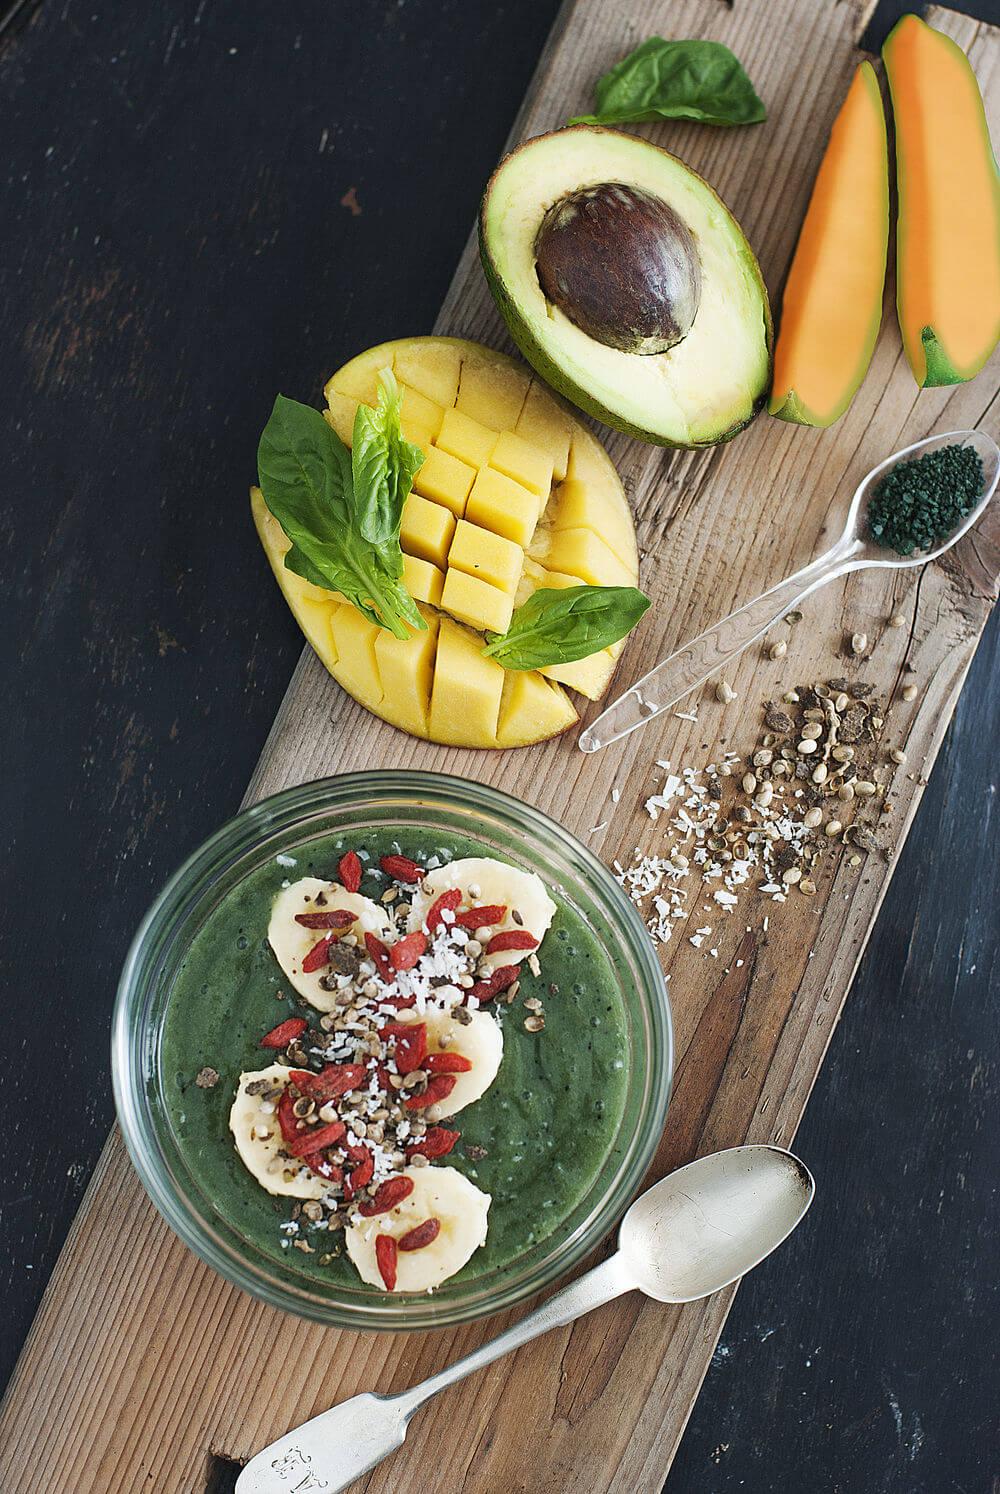 Spirulina, banana, coconut (shredded), hemp seeds, mango, cantaloupe, watermelon juice, avocado, goji berries and spinach smoothie